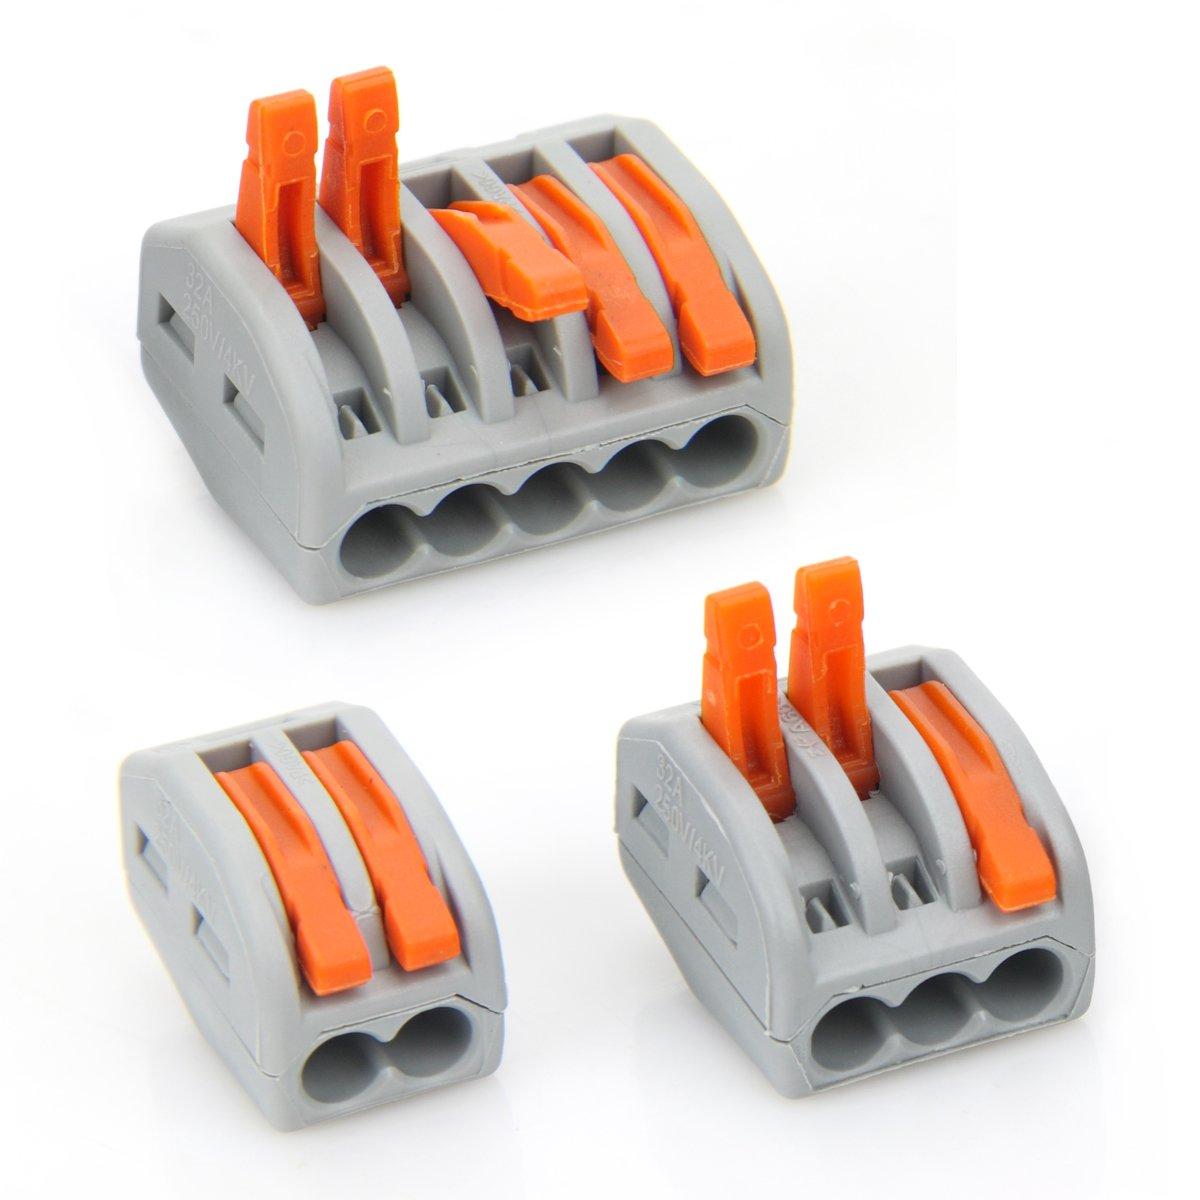 AUSPA 222-412 (30) 222-413 (30) 222-415 (30) Lever-Nut Assortment Pack Conductor Compact Wire Connectors Pack-90pcs